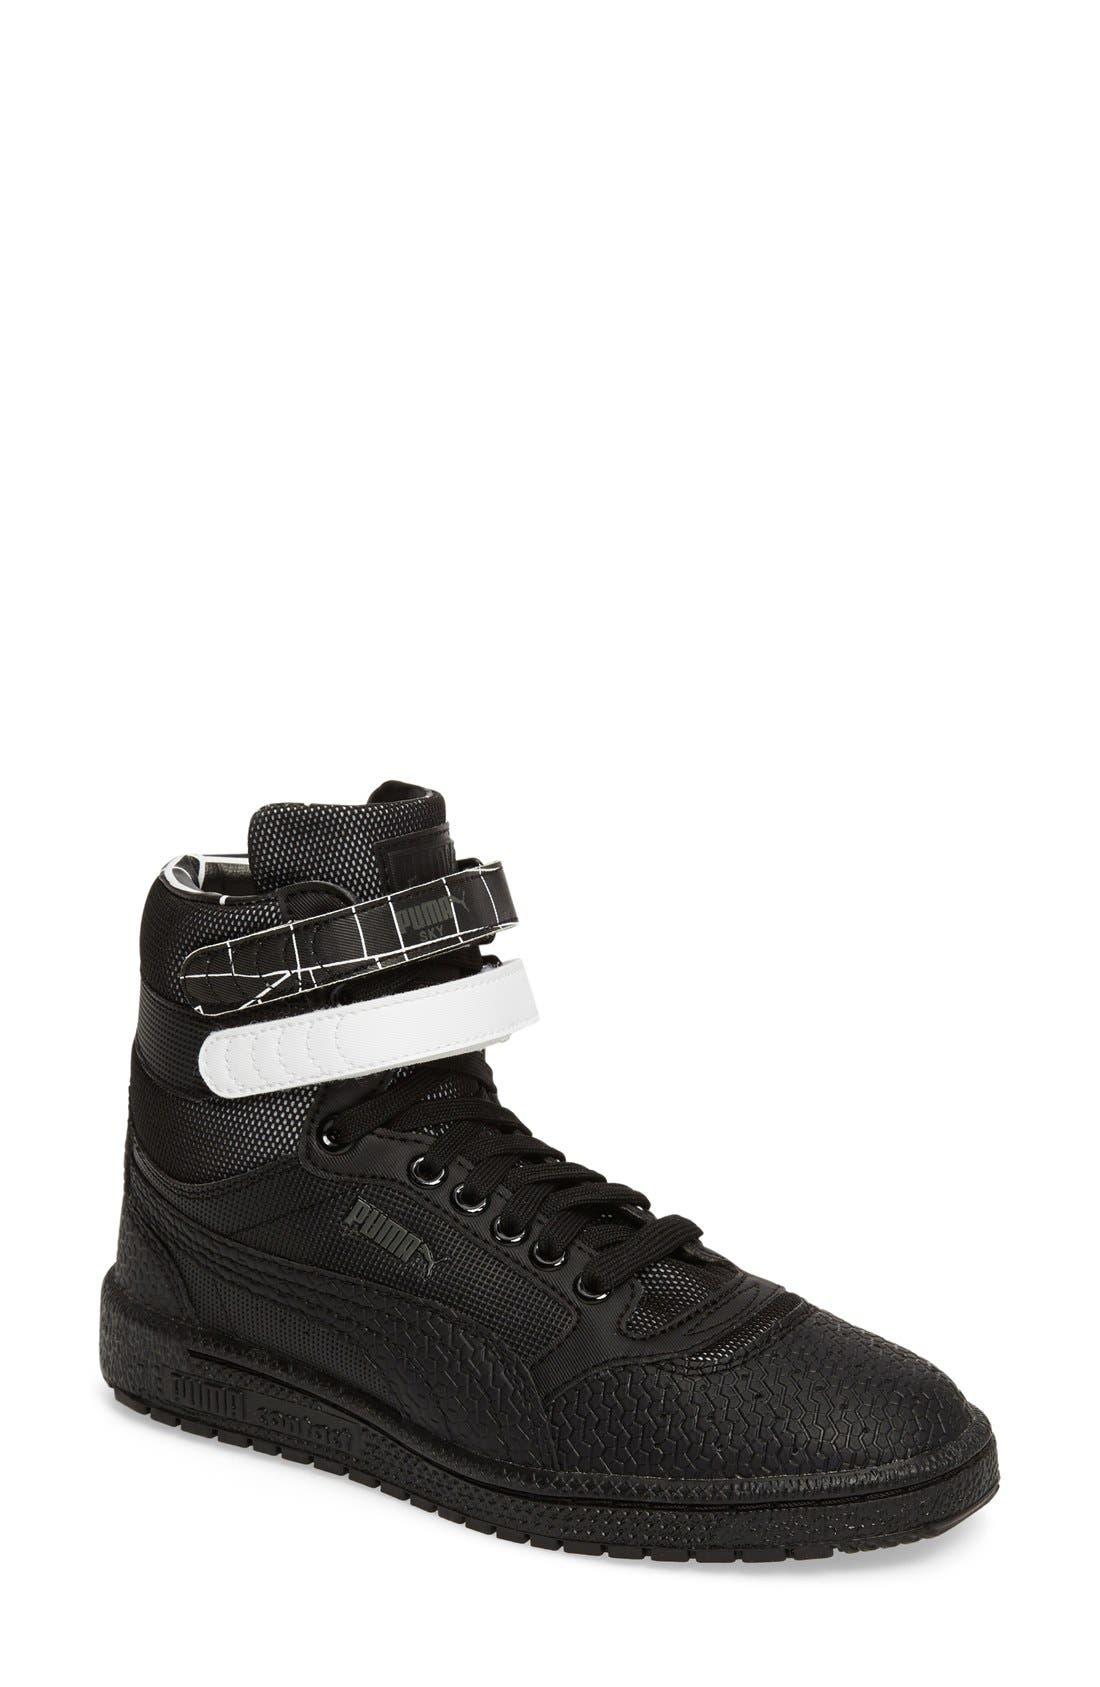 PUMA Sky II Hi Sneaker